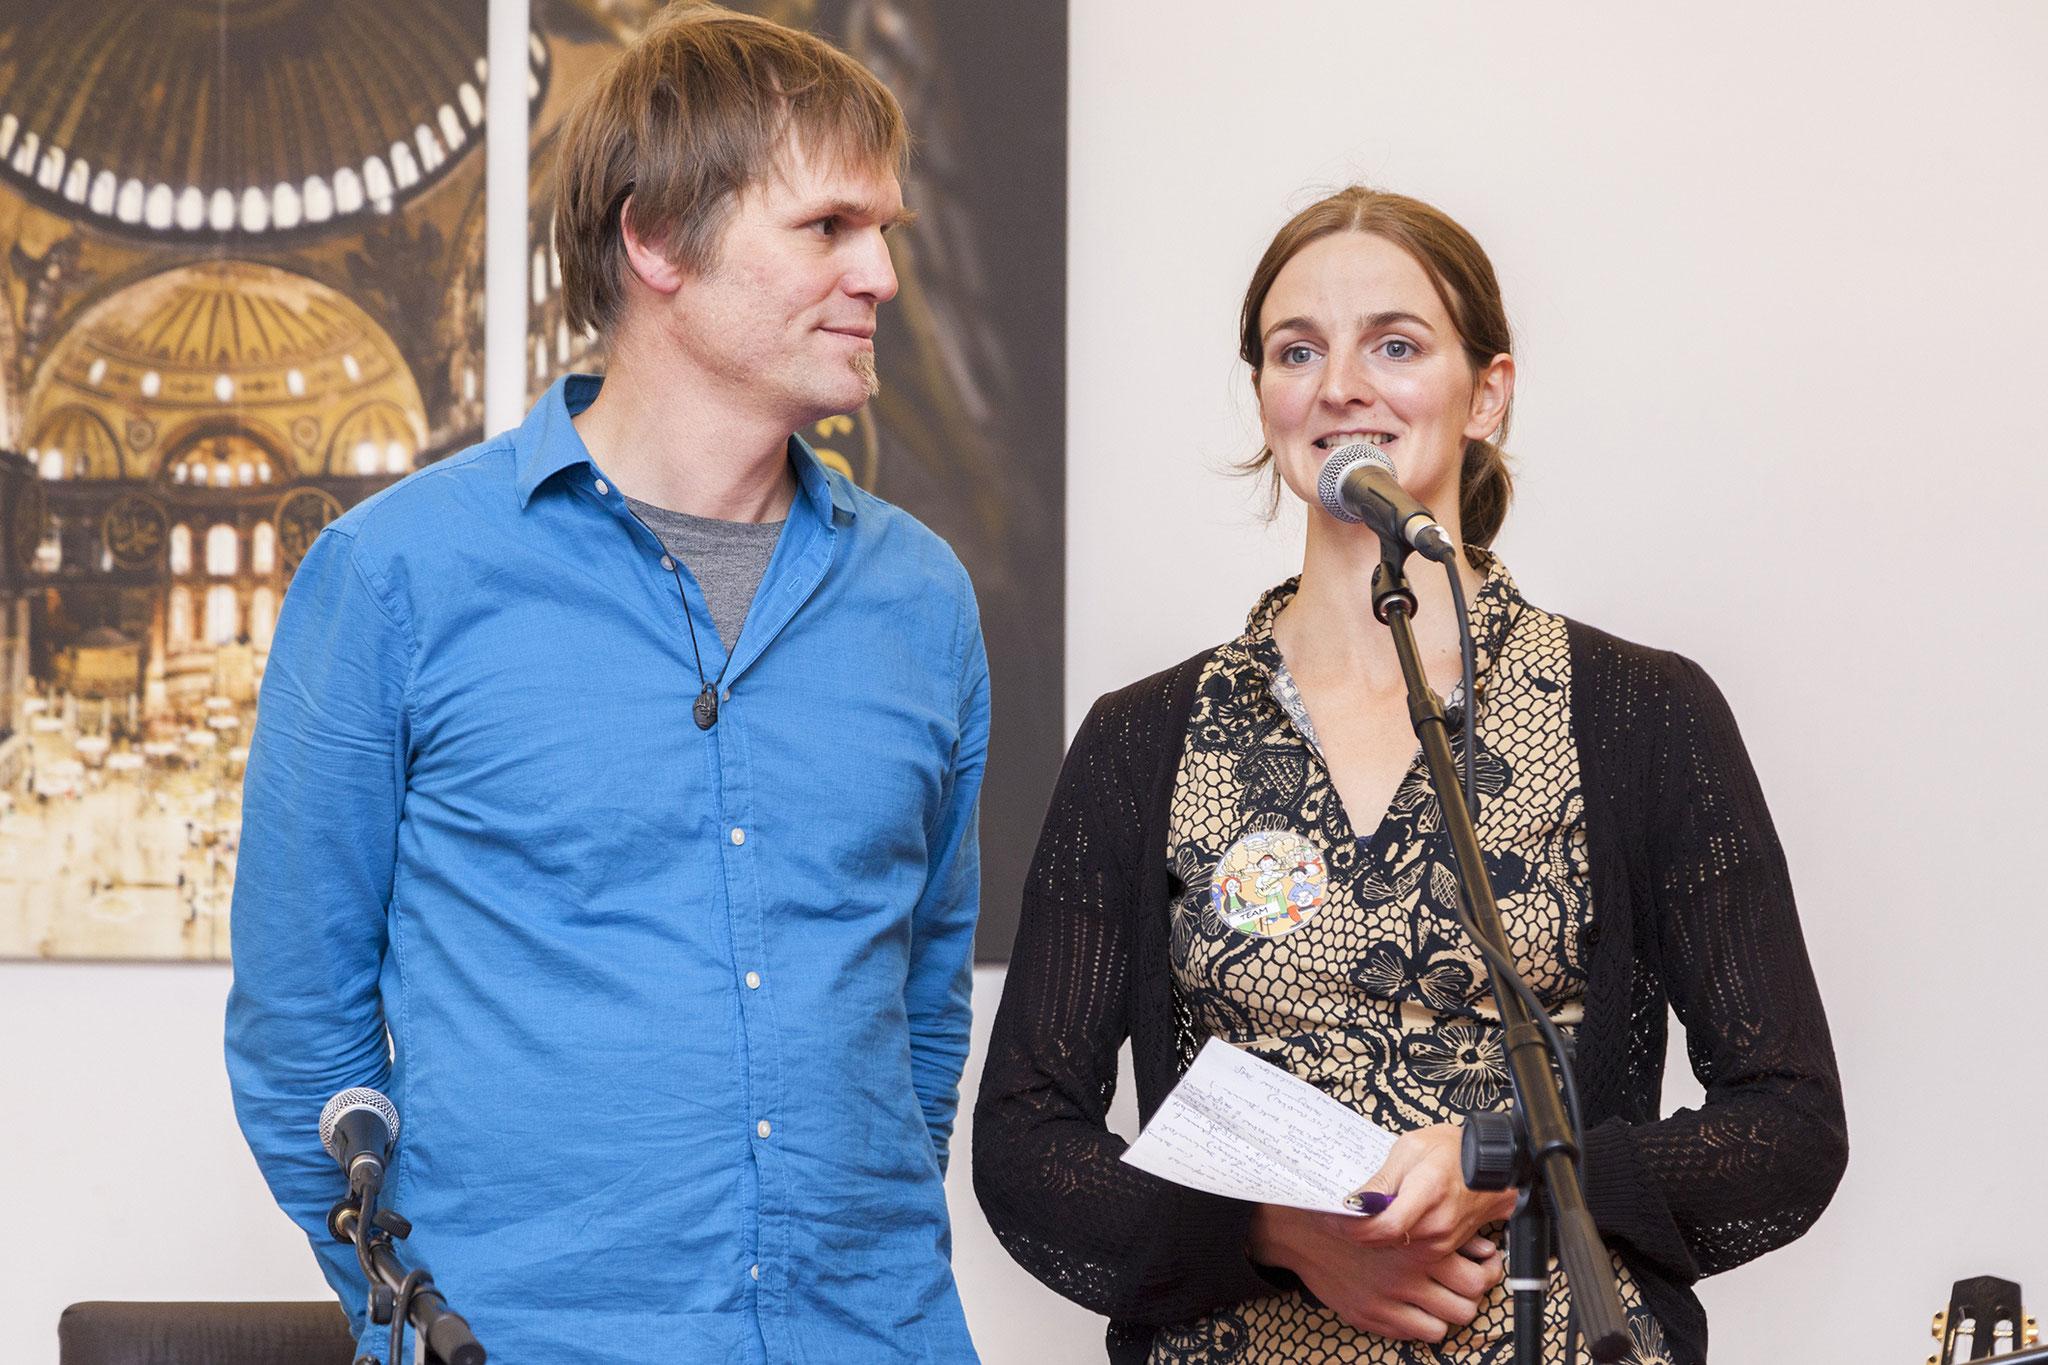 Begrüßung Kirschendieb & Perlensucher, Sebastian & Florina, Foto: Antonia Richter